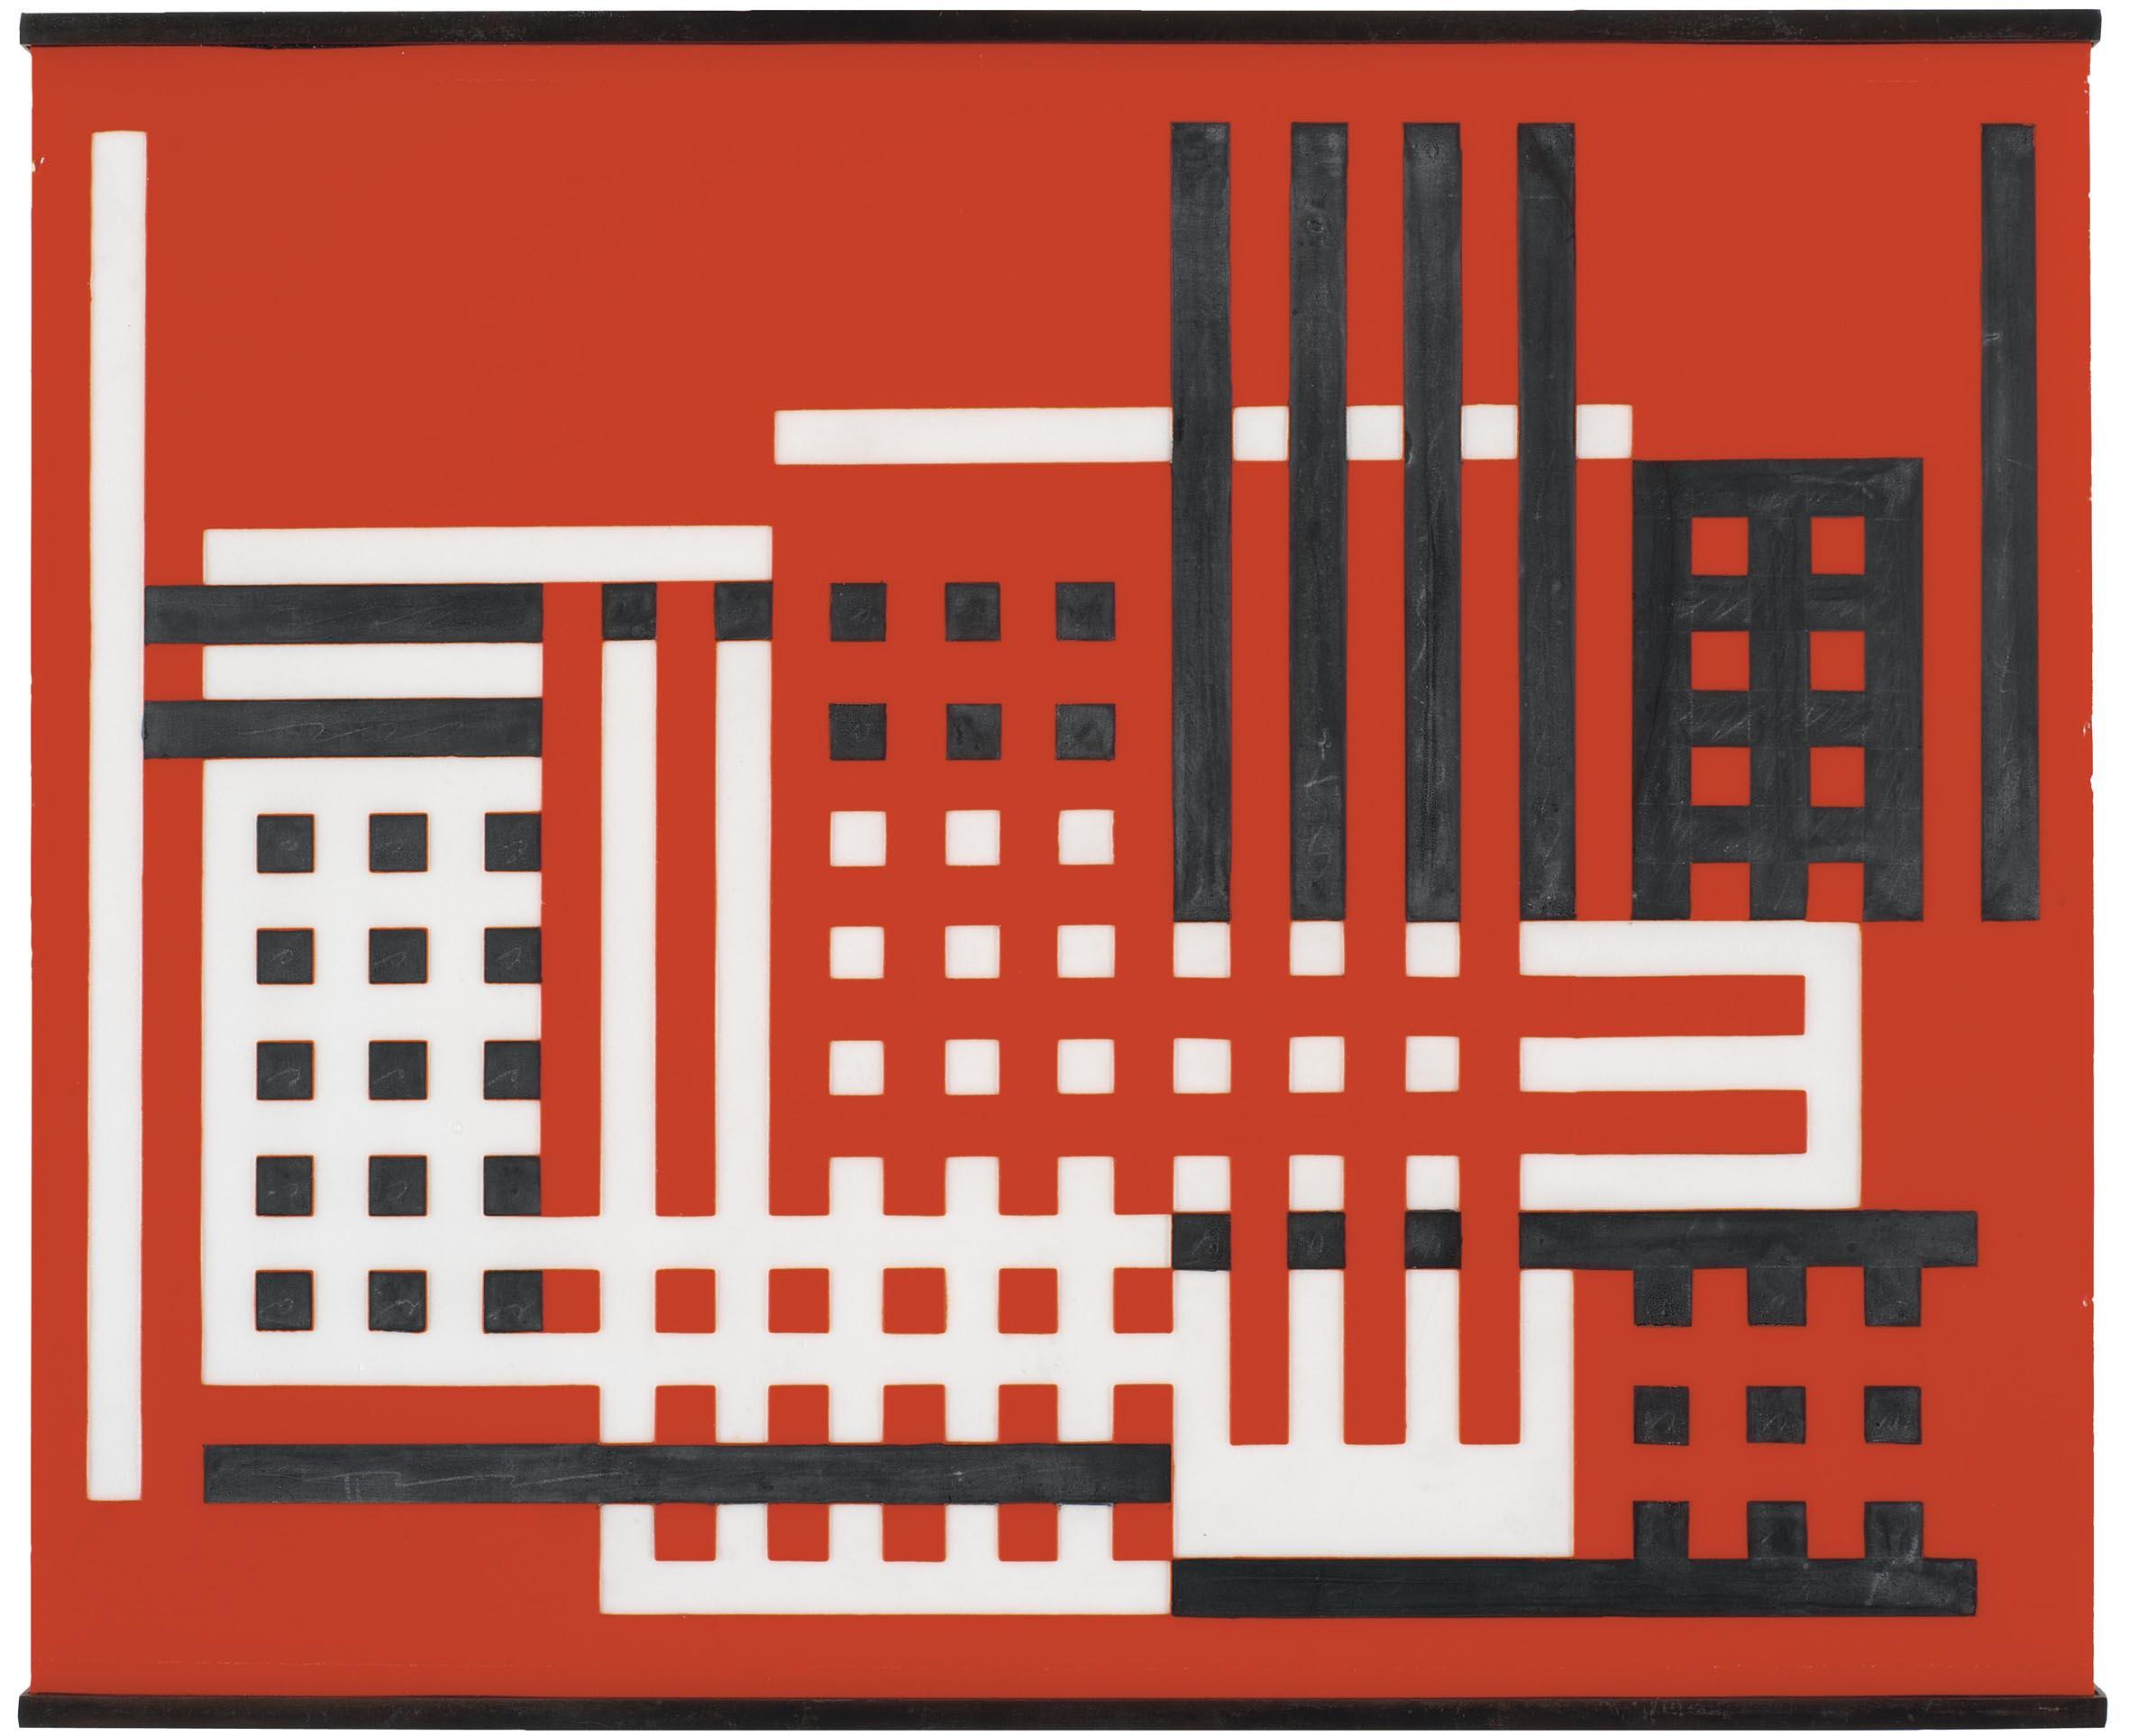 Frank Lloyd Wright Prints Josef Albers Minimum Means Maximum Effect Metalocus